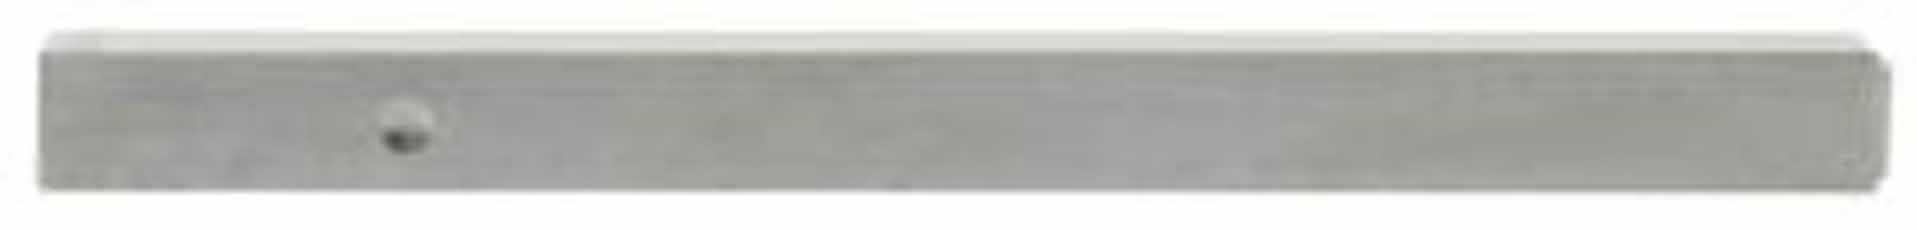 Vervanging hengel voor vergelijking Impact hardheidsmeter POLDI Nr.391100